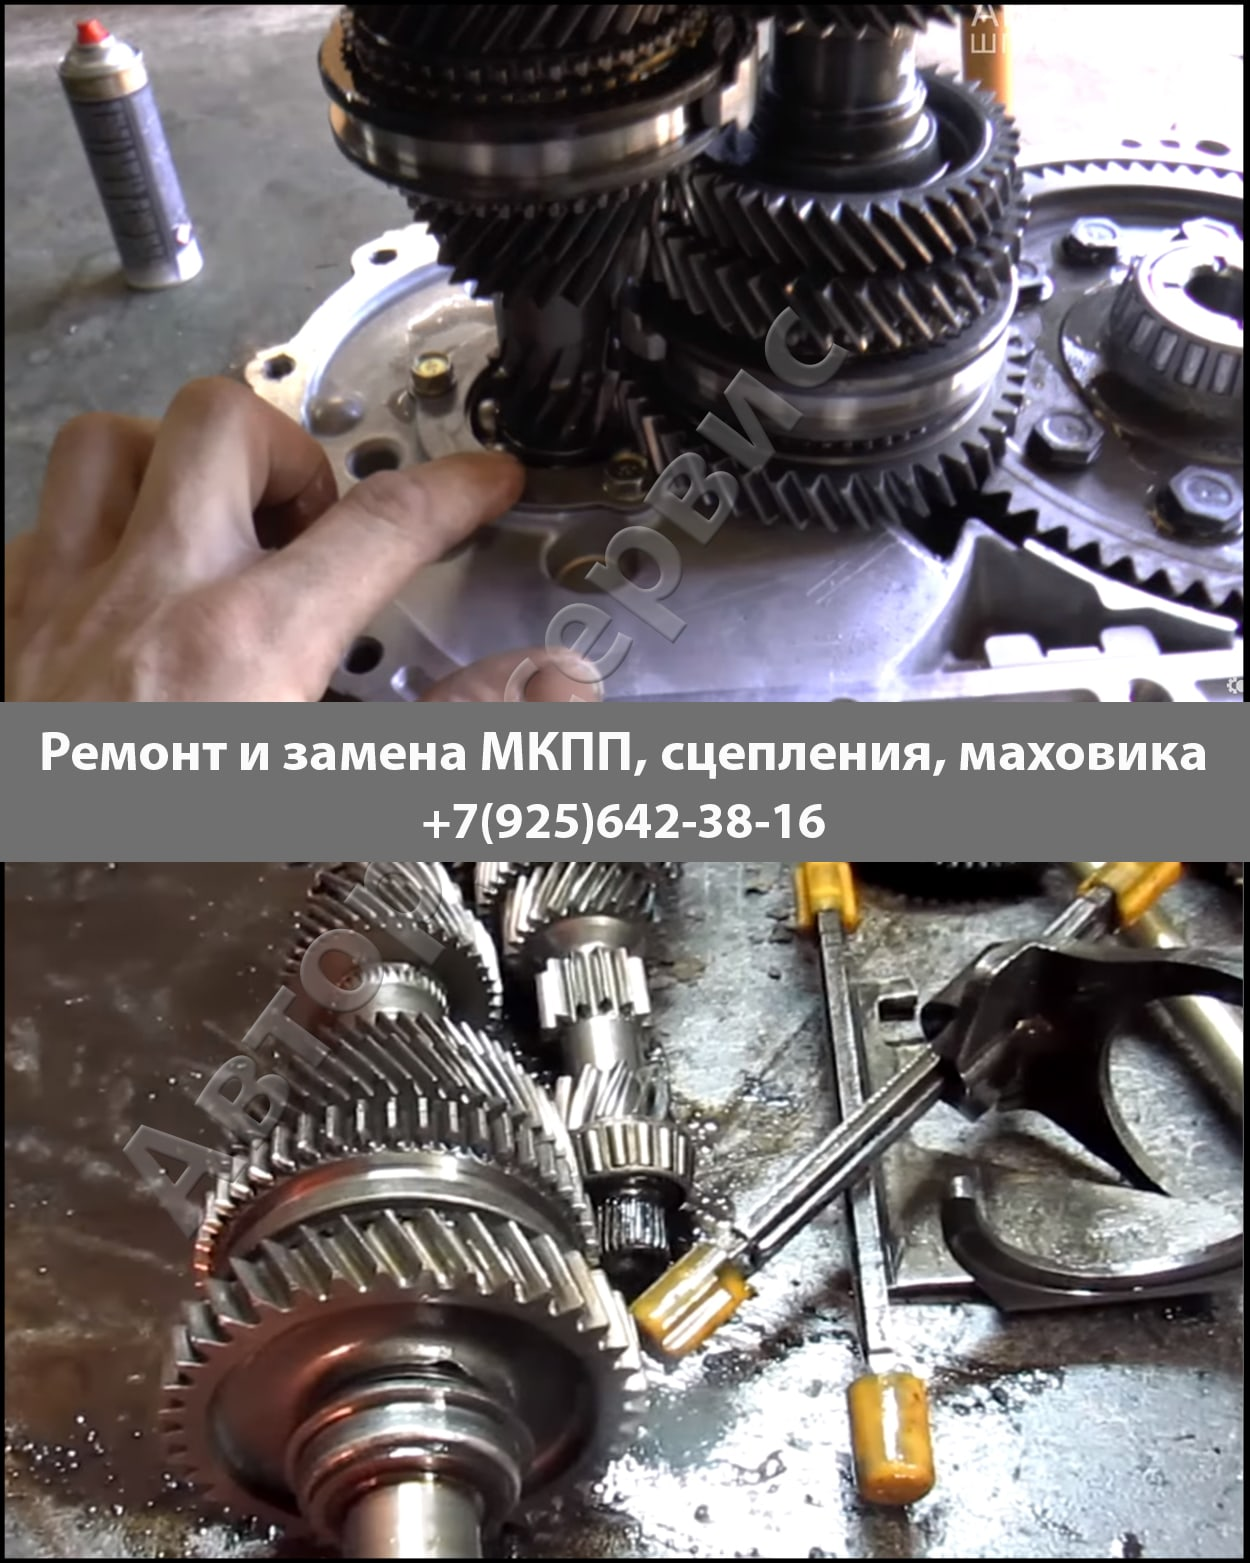 Ремонт МКПП Ховер